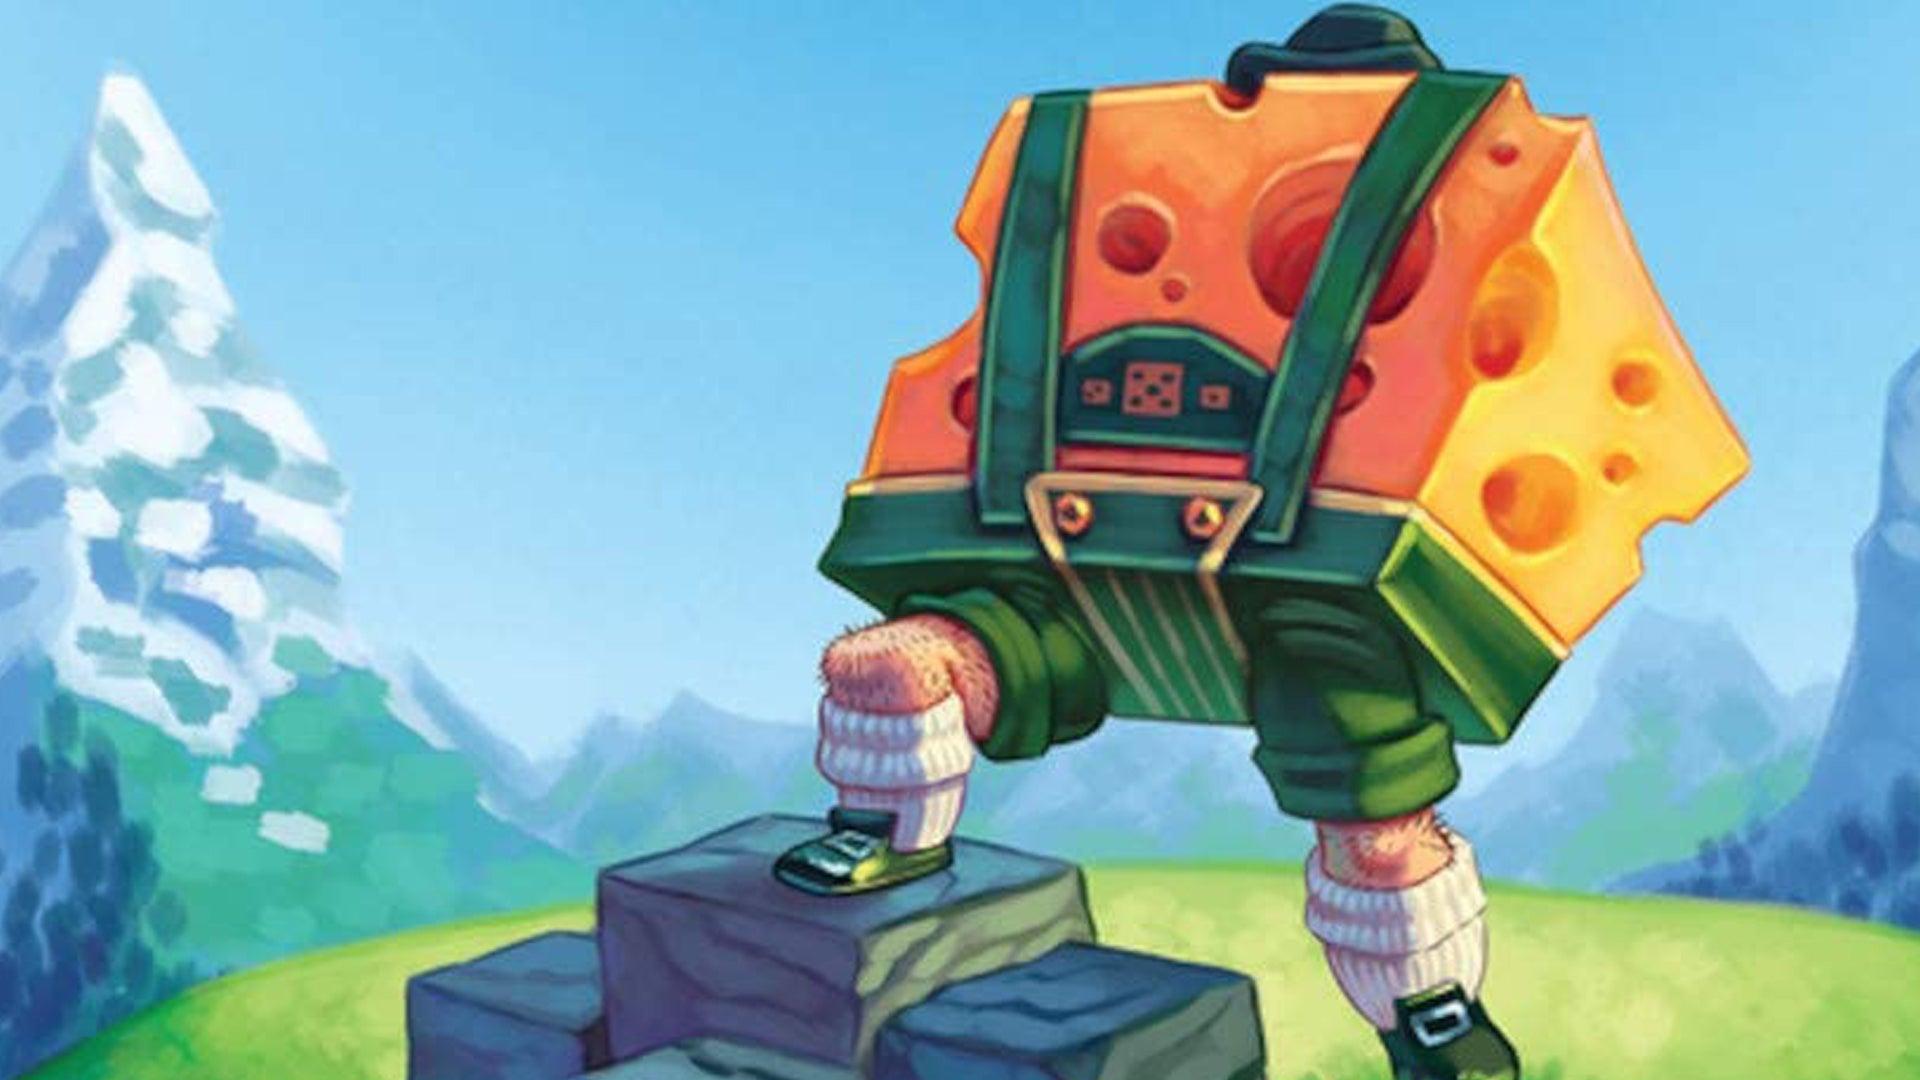 Cubitos board game artwork